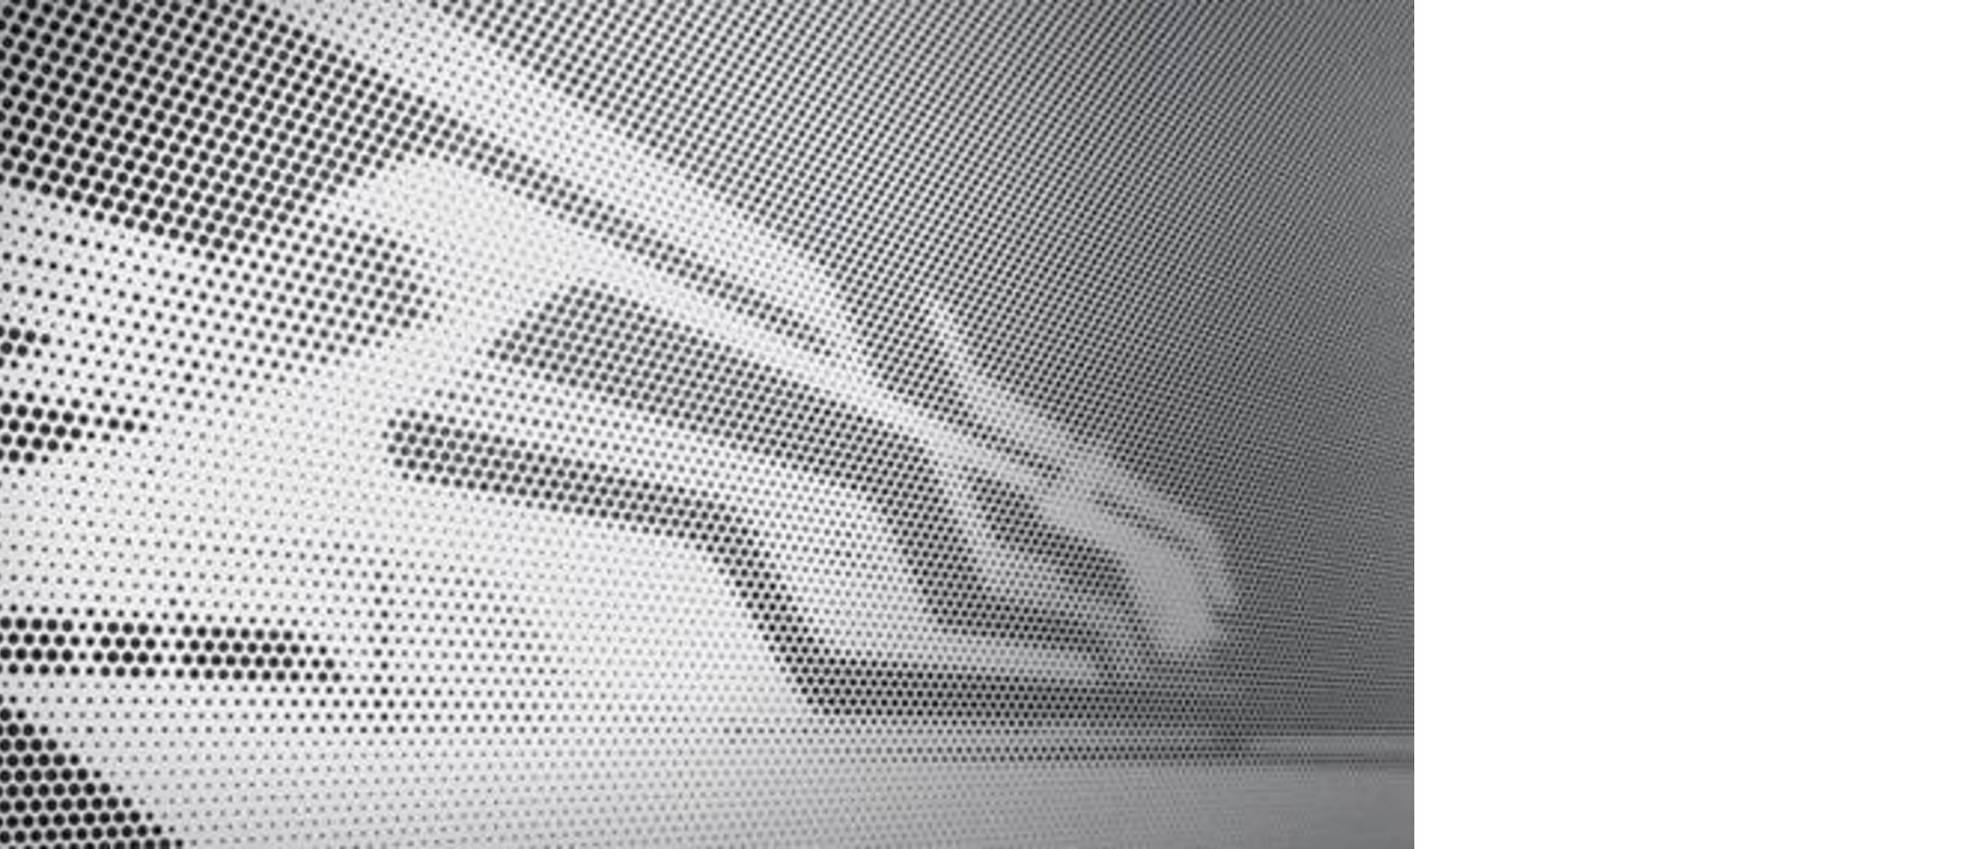 ausstellung zaha hadid berlin floornature. Black Bedroom Furniture Sets. Home Design Ideas